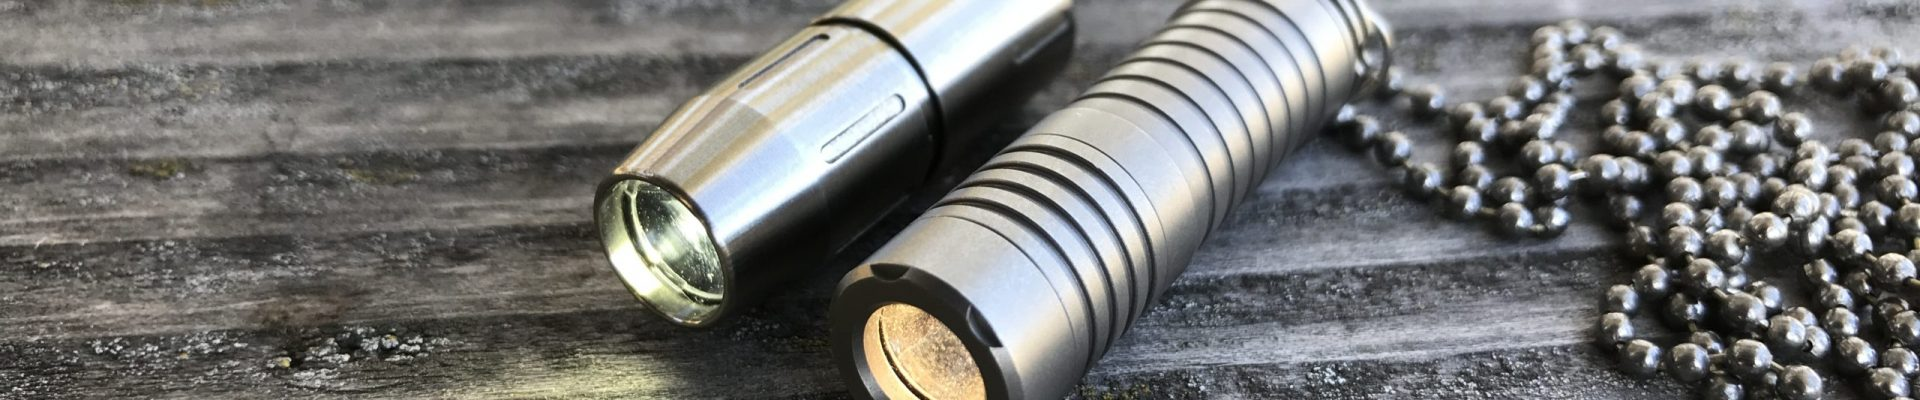 Keychain Flashlights – Buyer's Guide